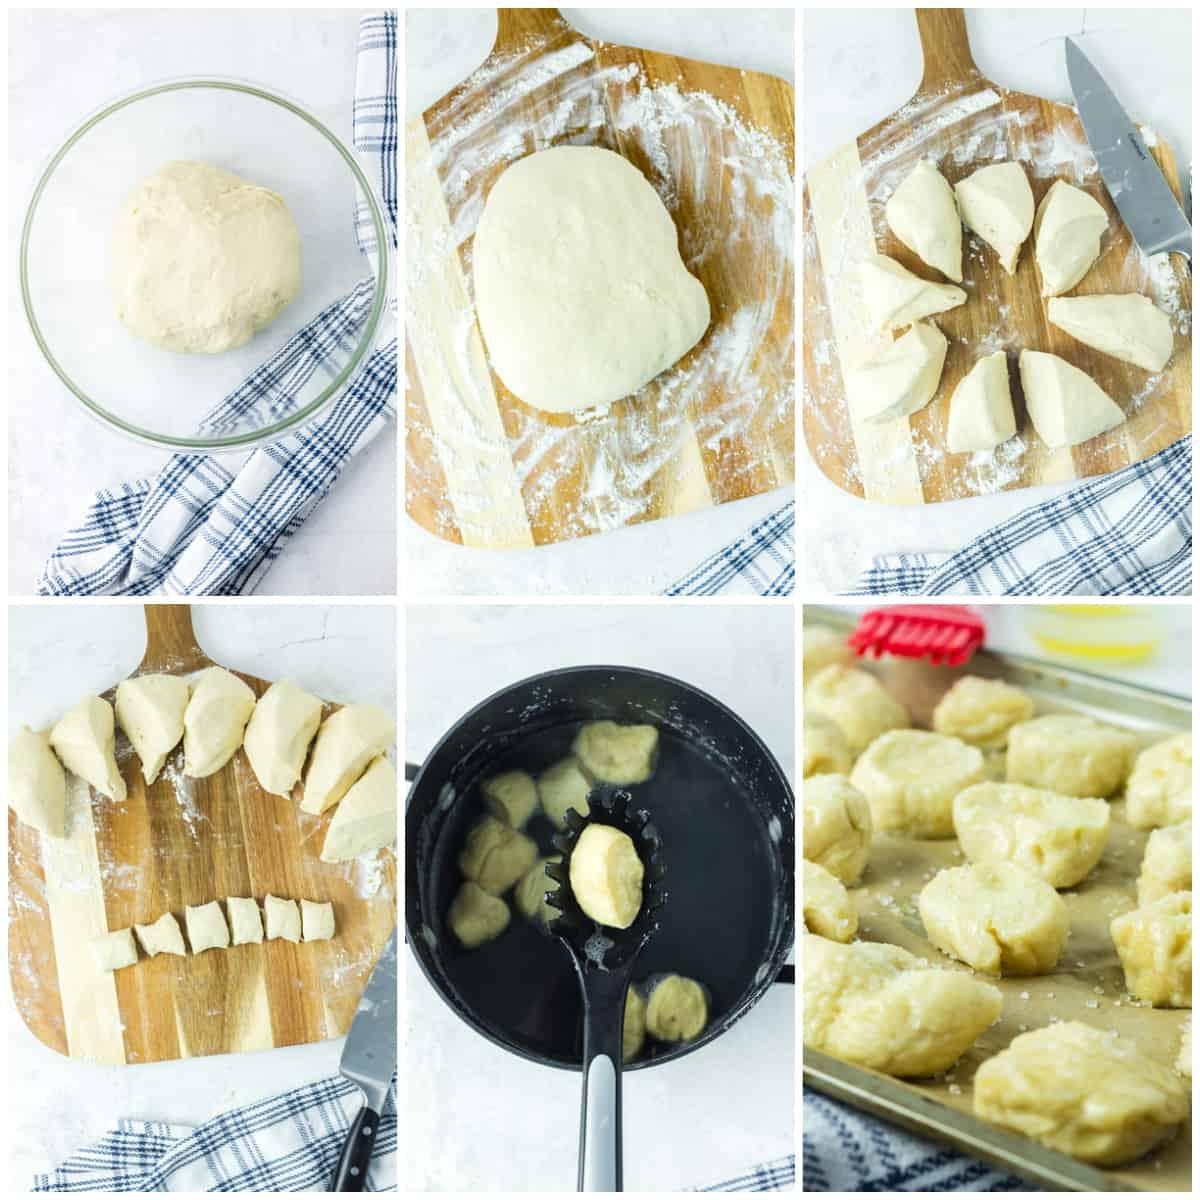 Step by step photos on how to make Pretzel Bites